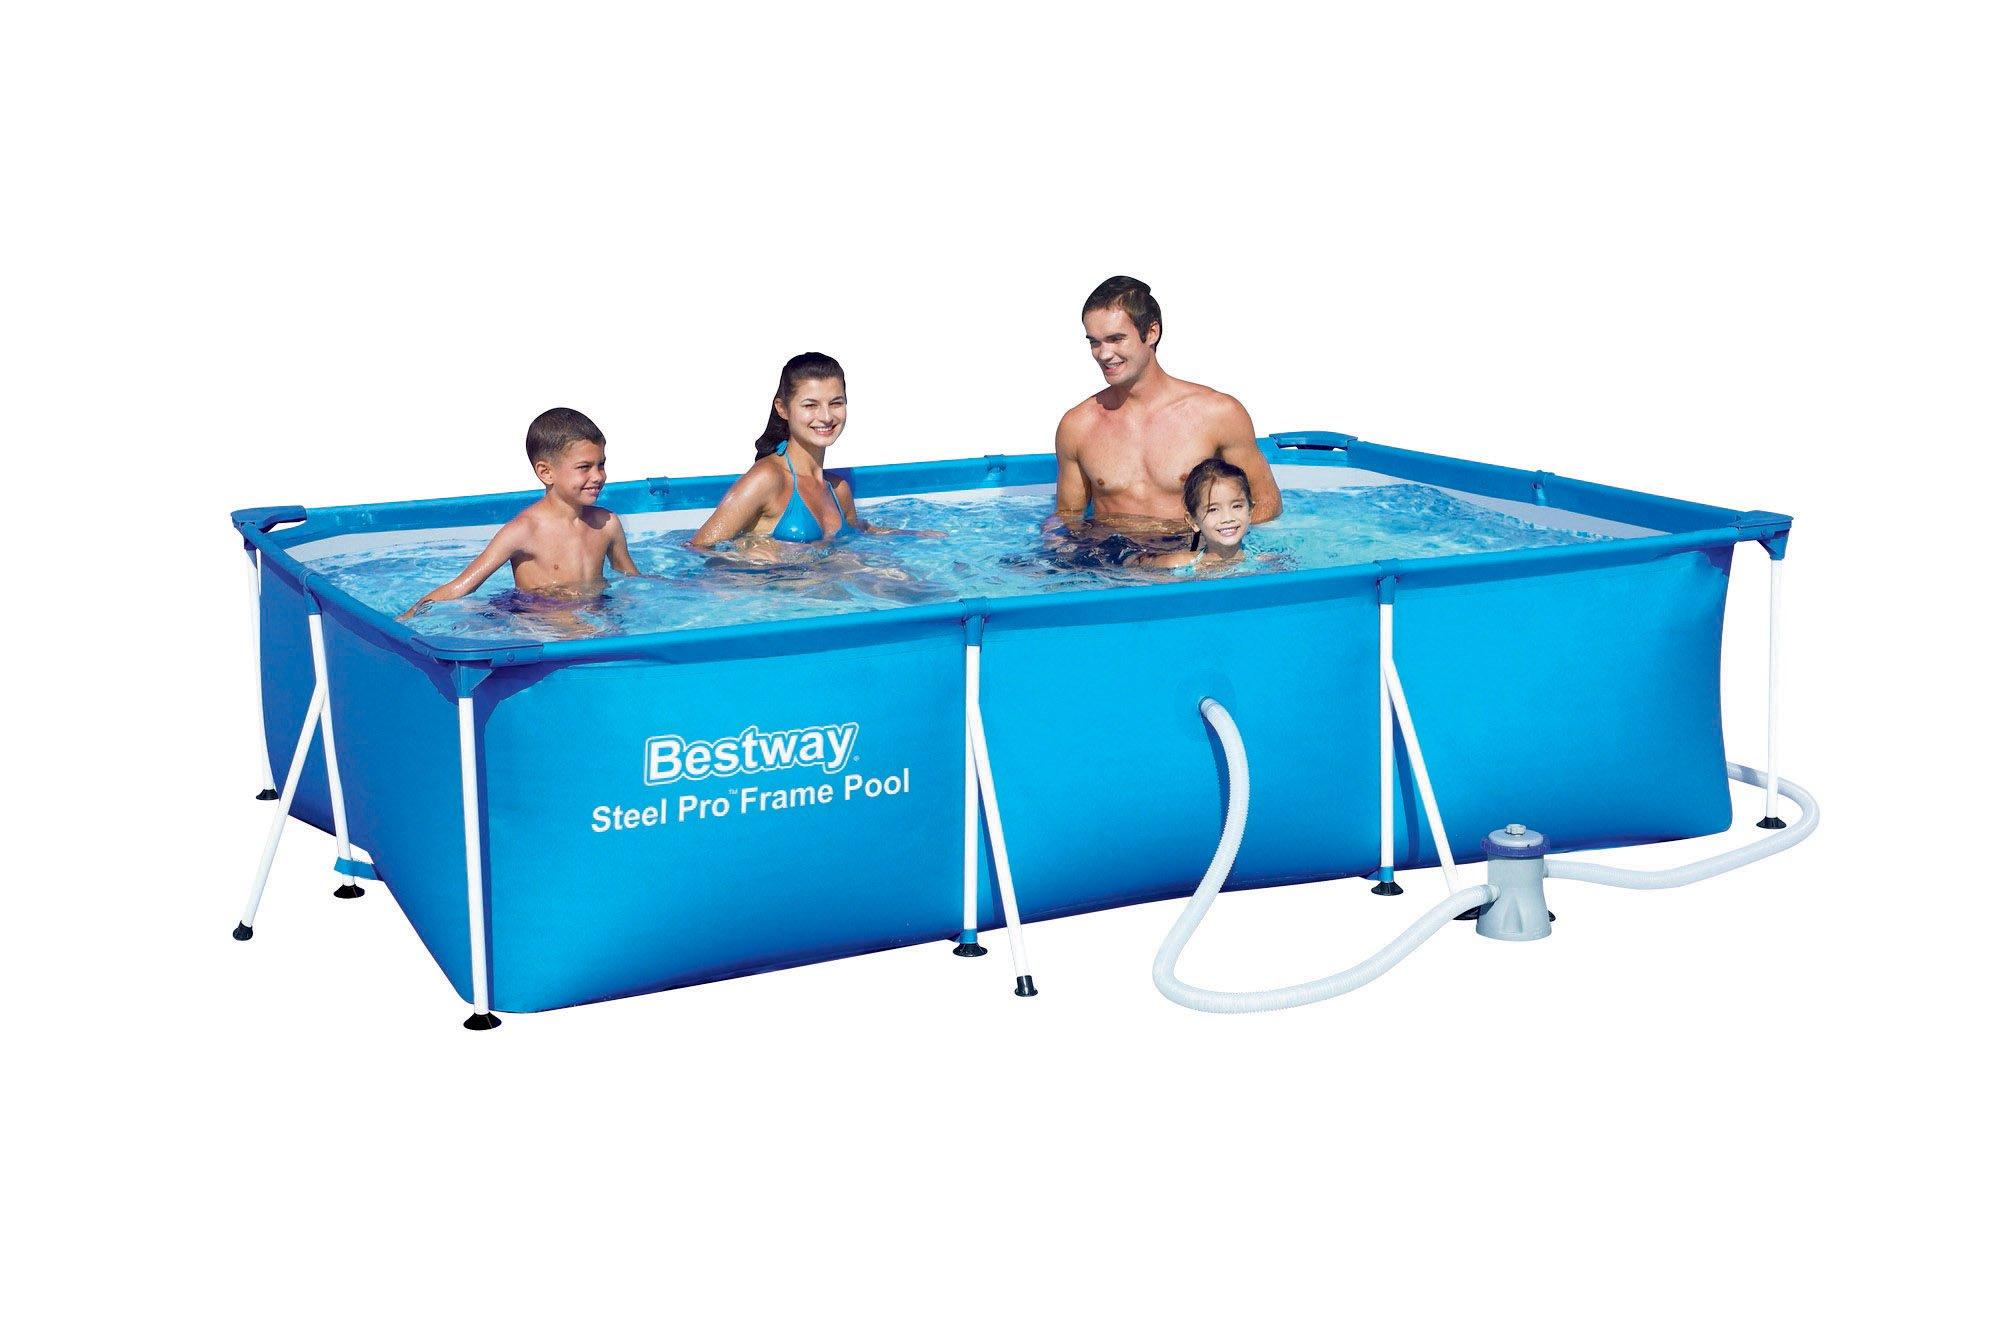 Bestway bazén 300 cm x 201 cm x 66 cm 6 v 1 56411